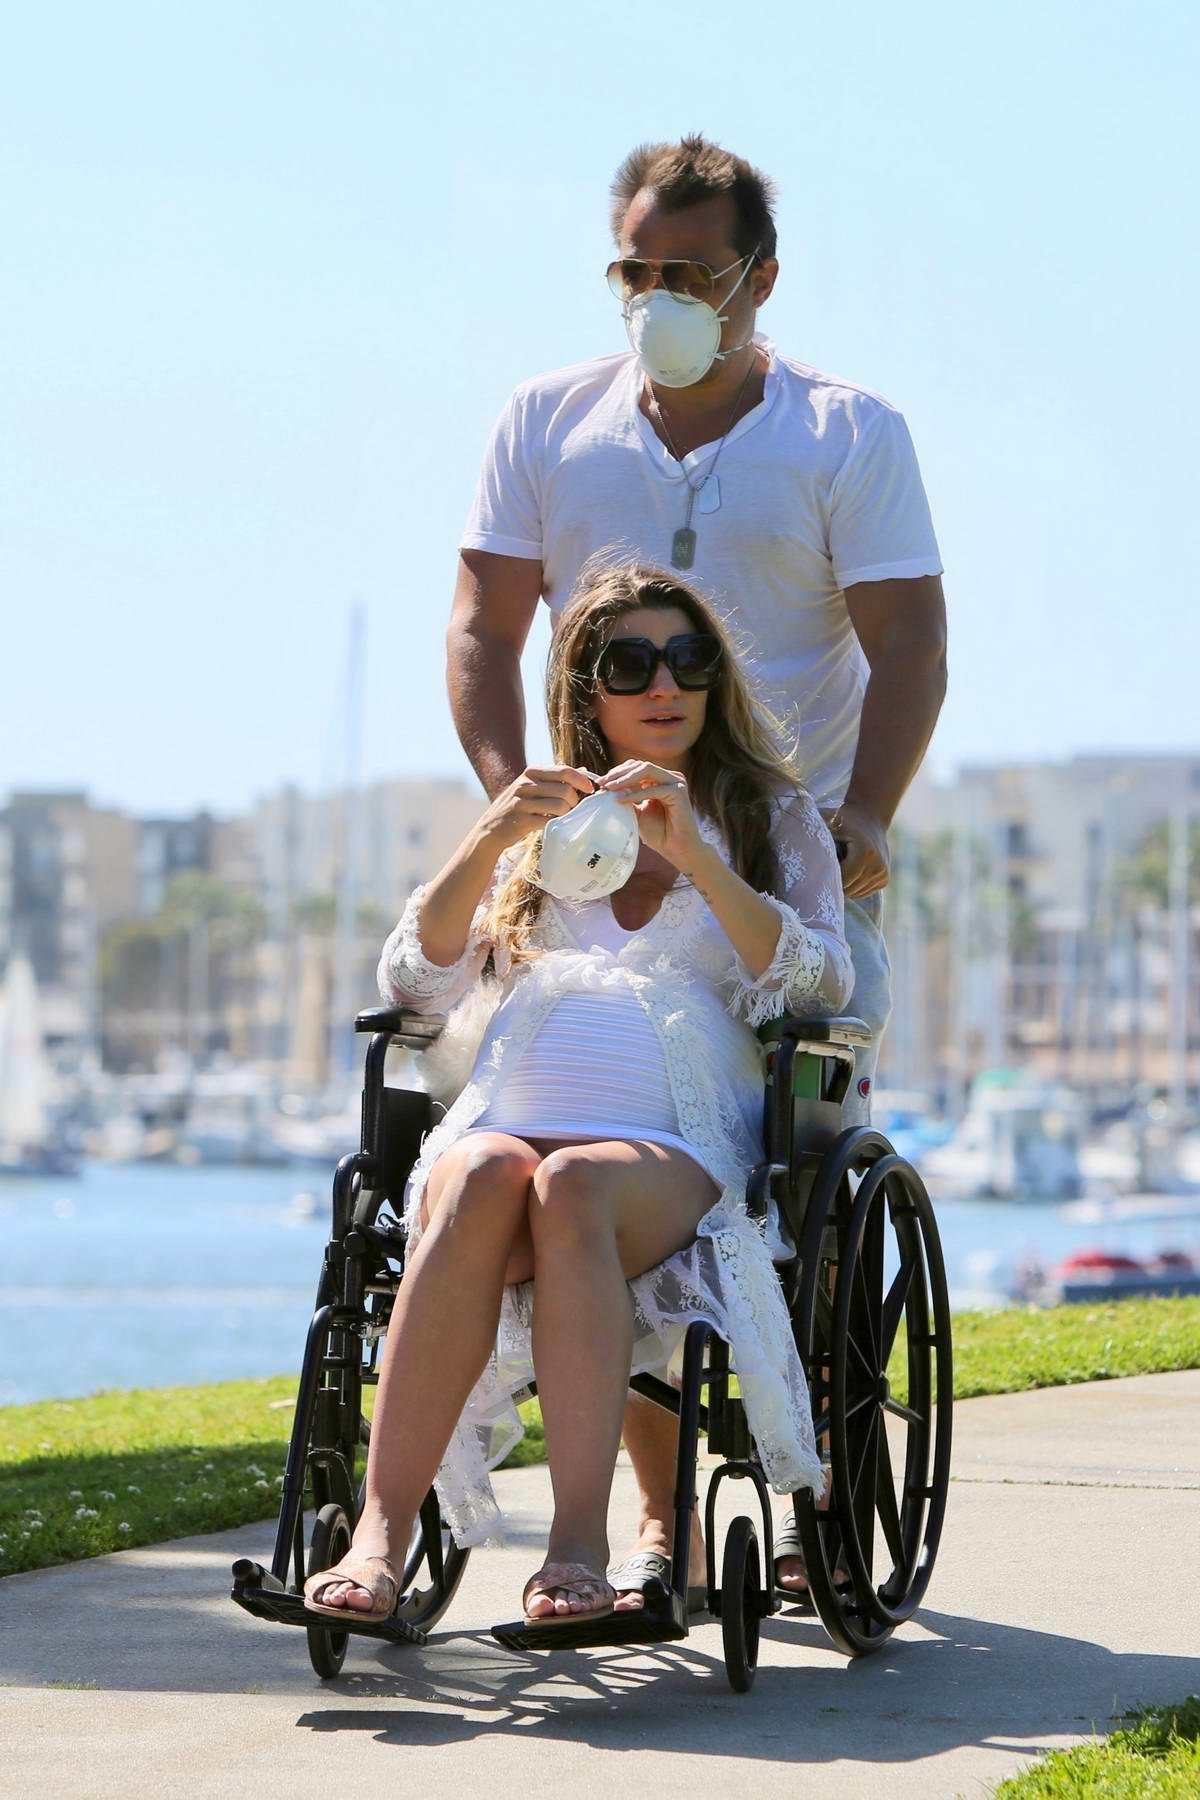 Rachel McCord takes a break from quarantine as she gets some fresh air in Marina Del Rey, California